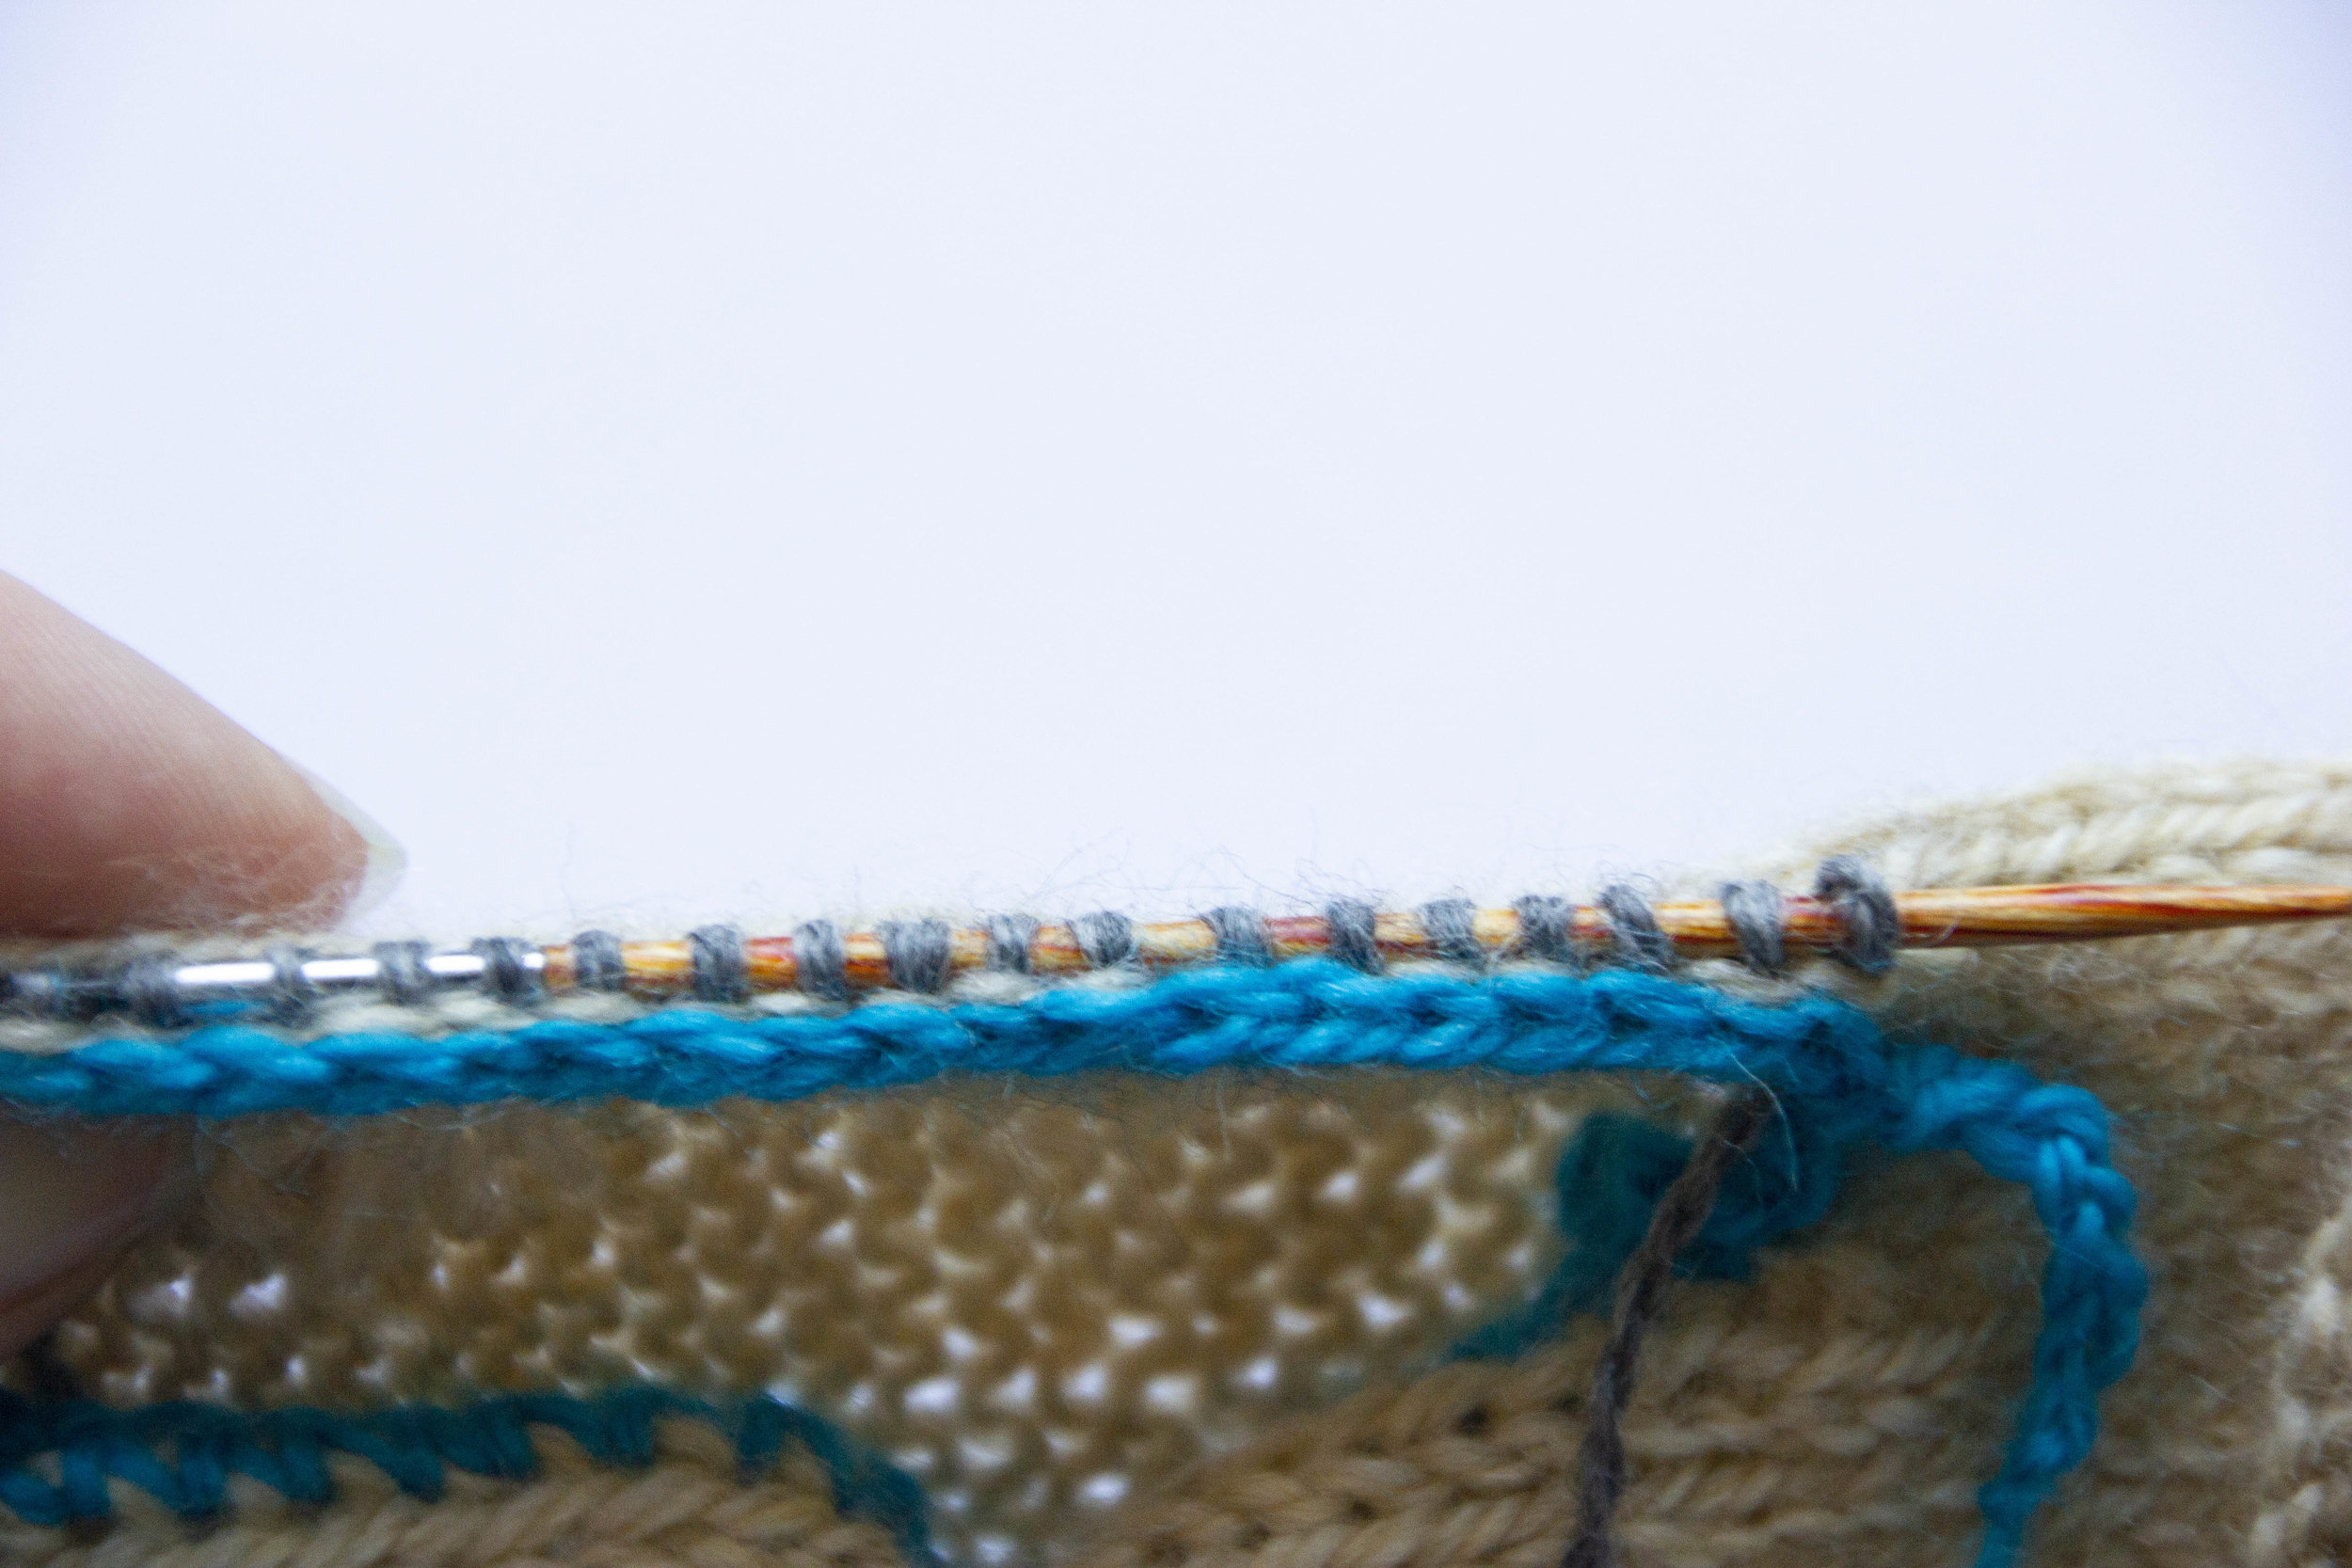 merele crochet steek 12.jpg